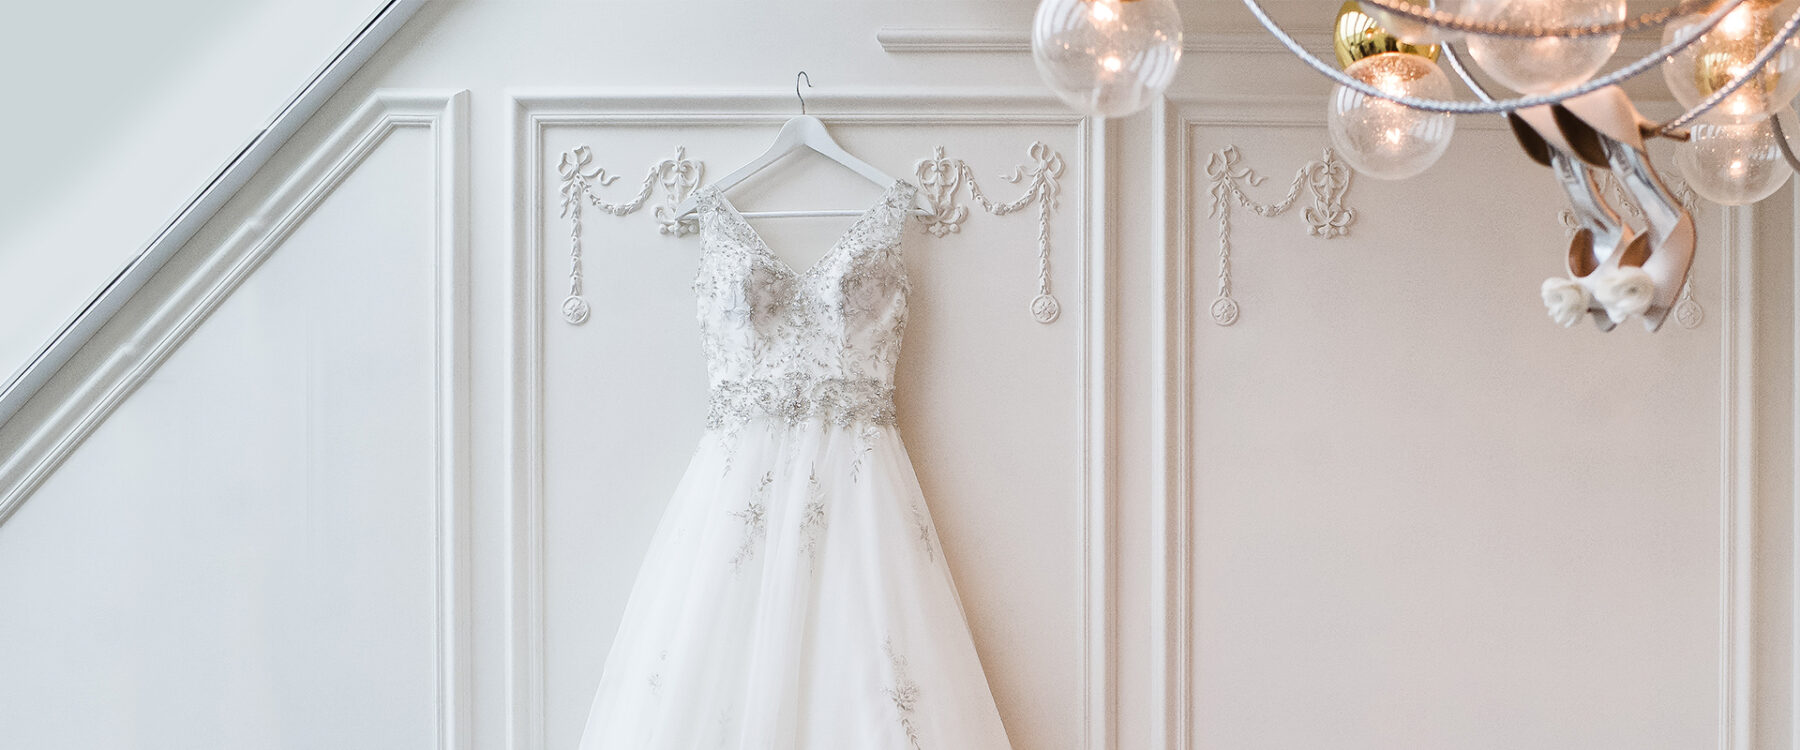 Wedding Dress After the wedding